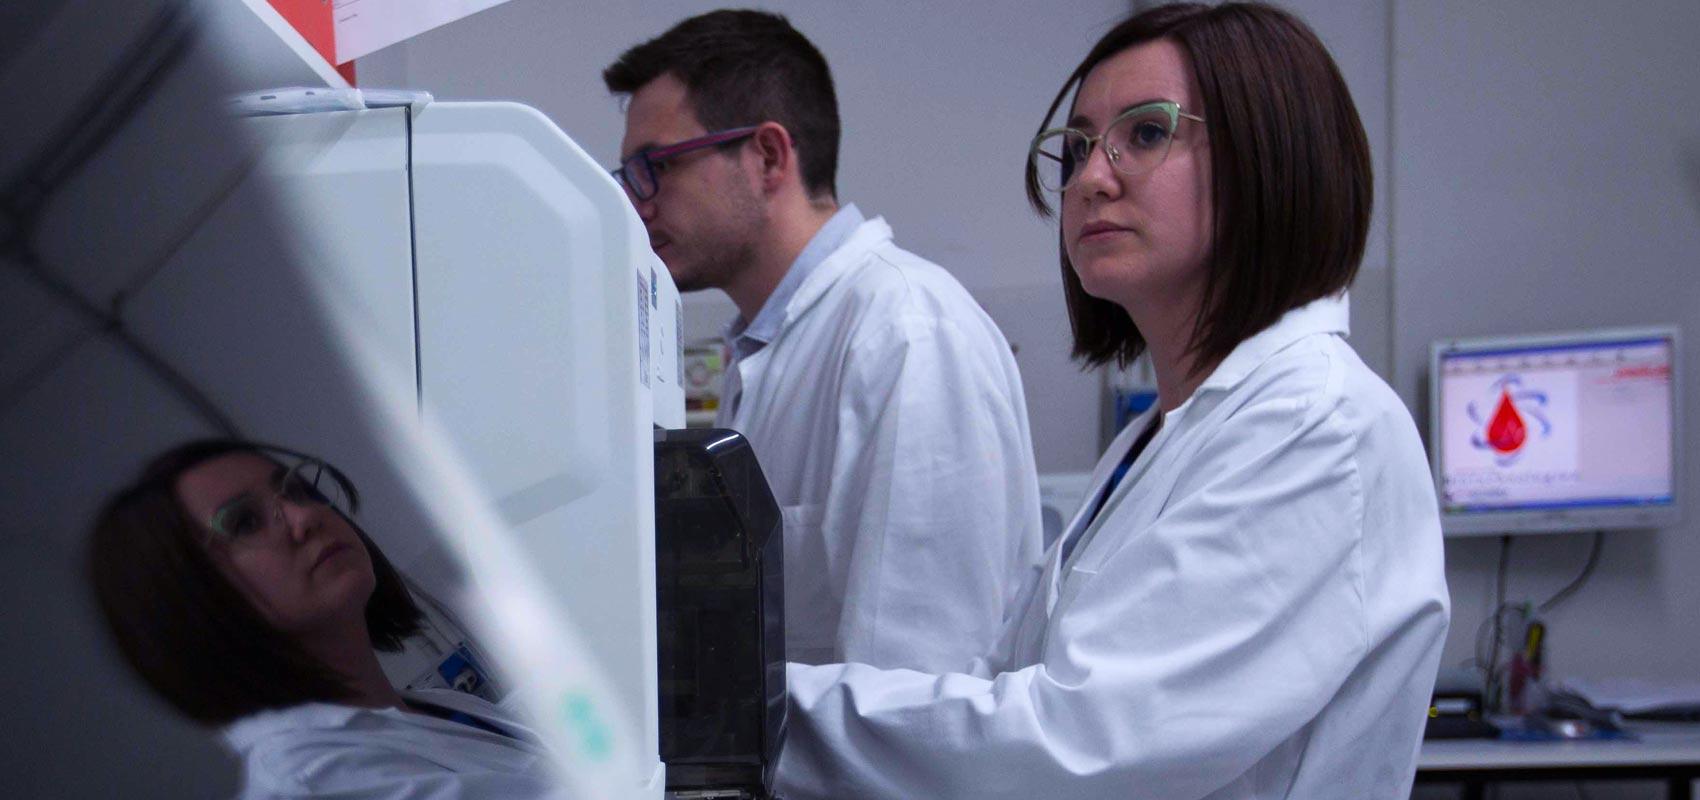 analisi-mediche-laboratorio-biotechnologies-agrigento-caltanissetta-san-giovanni-gemini-mussomeli-esami-sangue-emocromo-urine-4